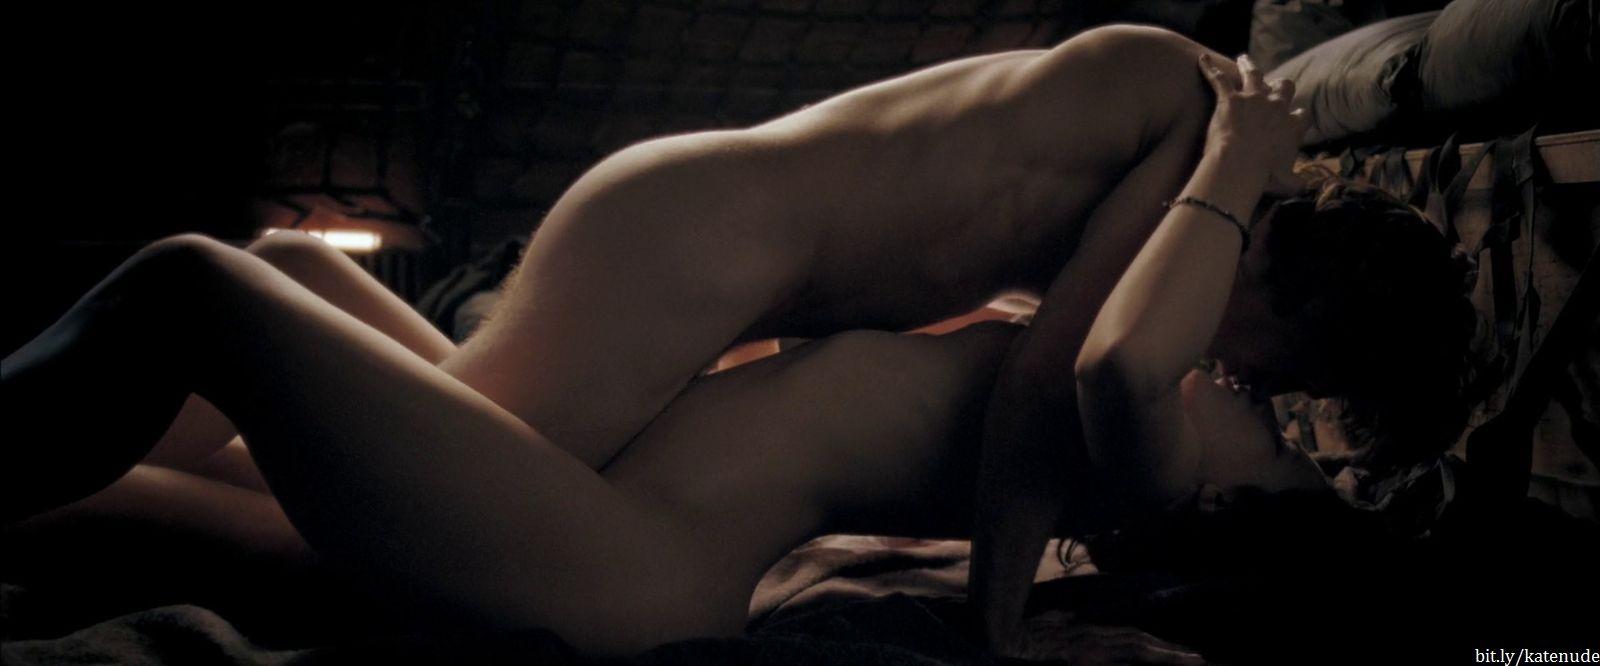 nude scene beckinsale Kate